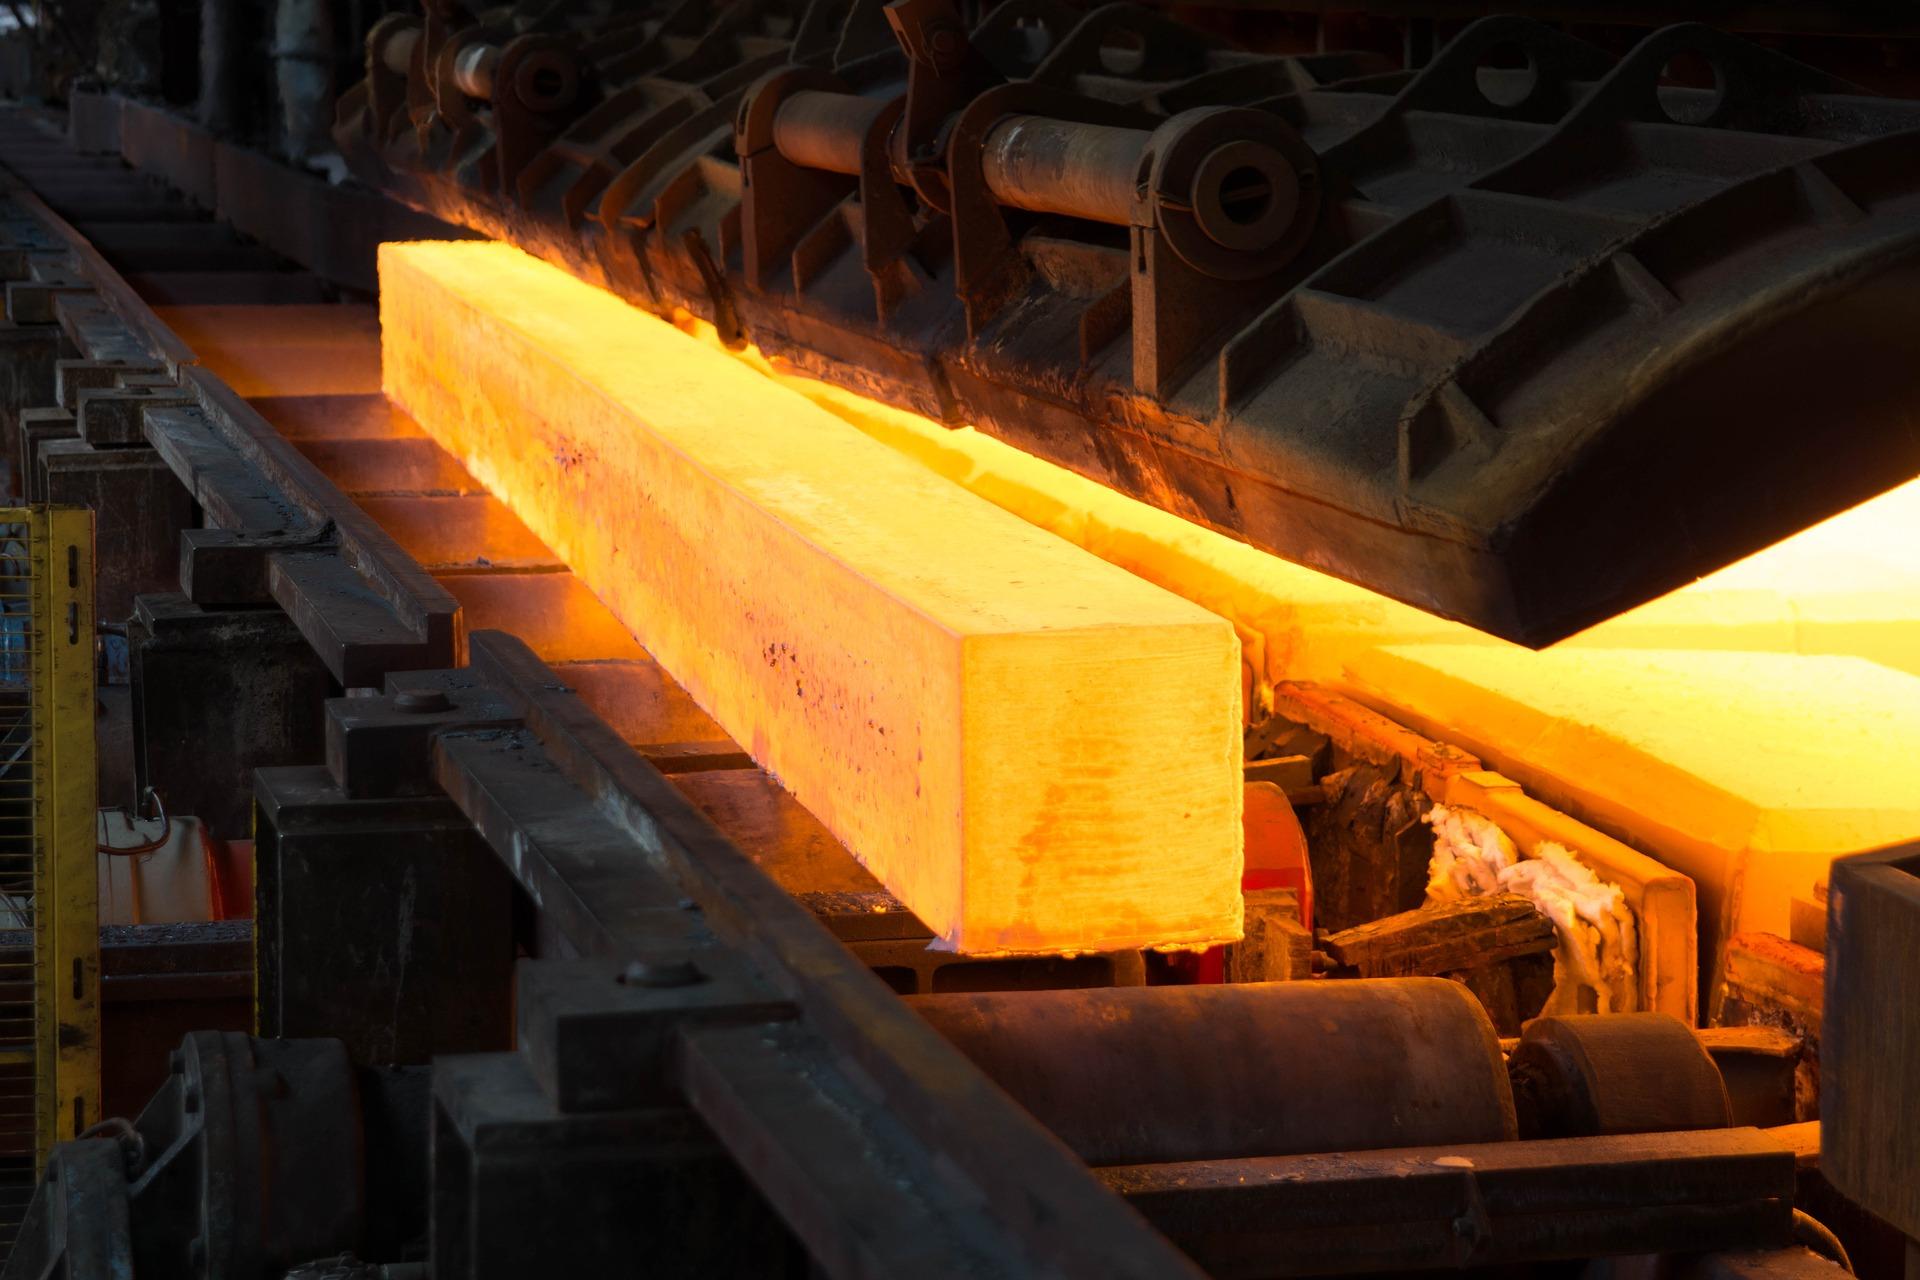 Trump, Turnbull working on steel tariff exemption agreement